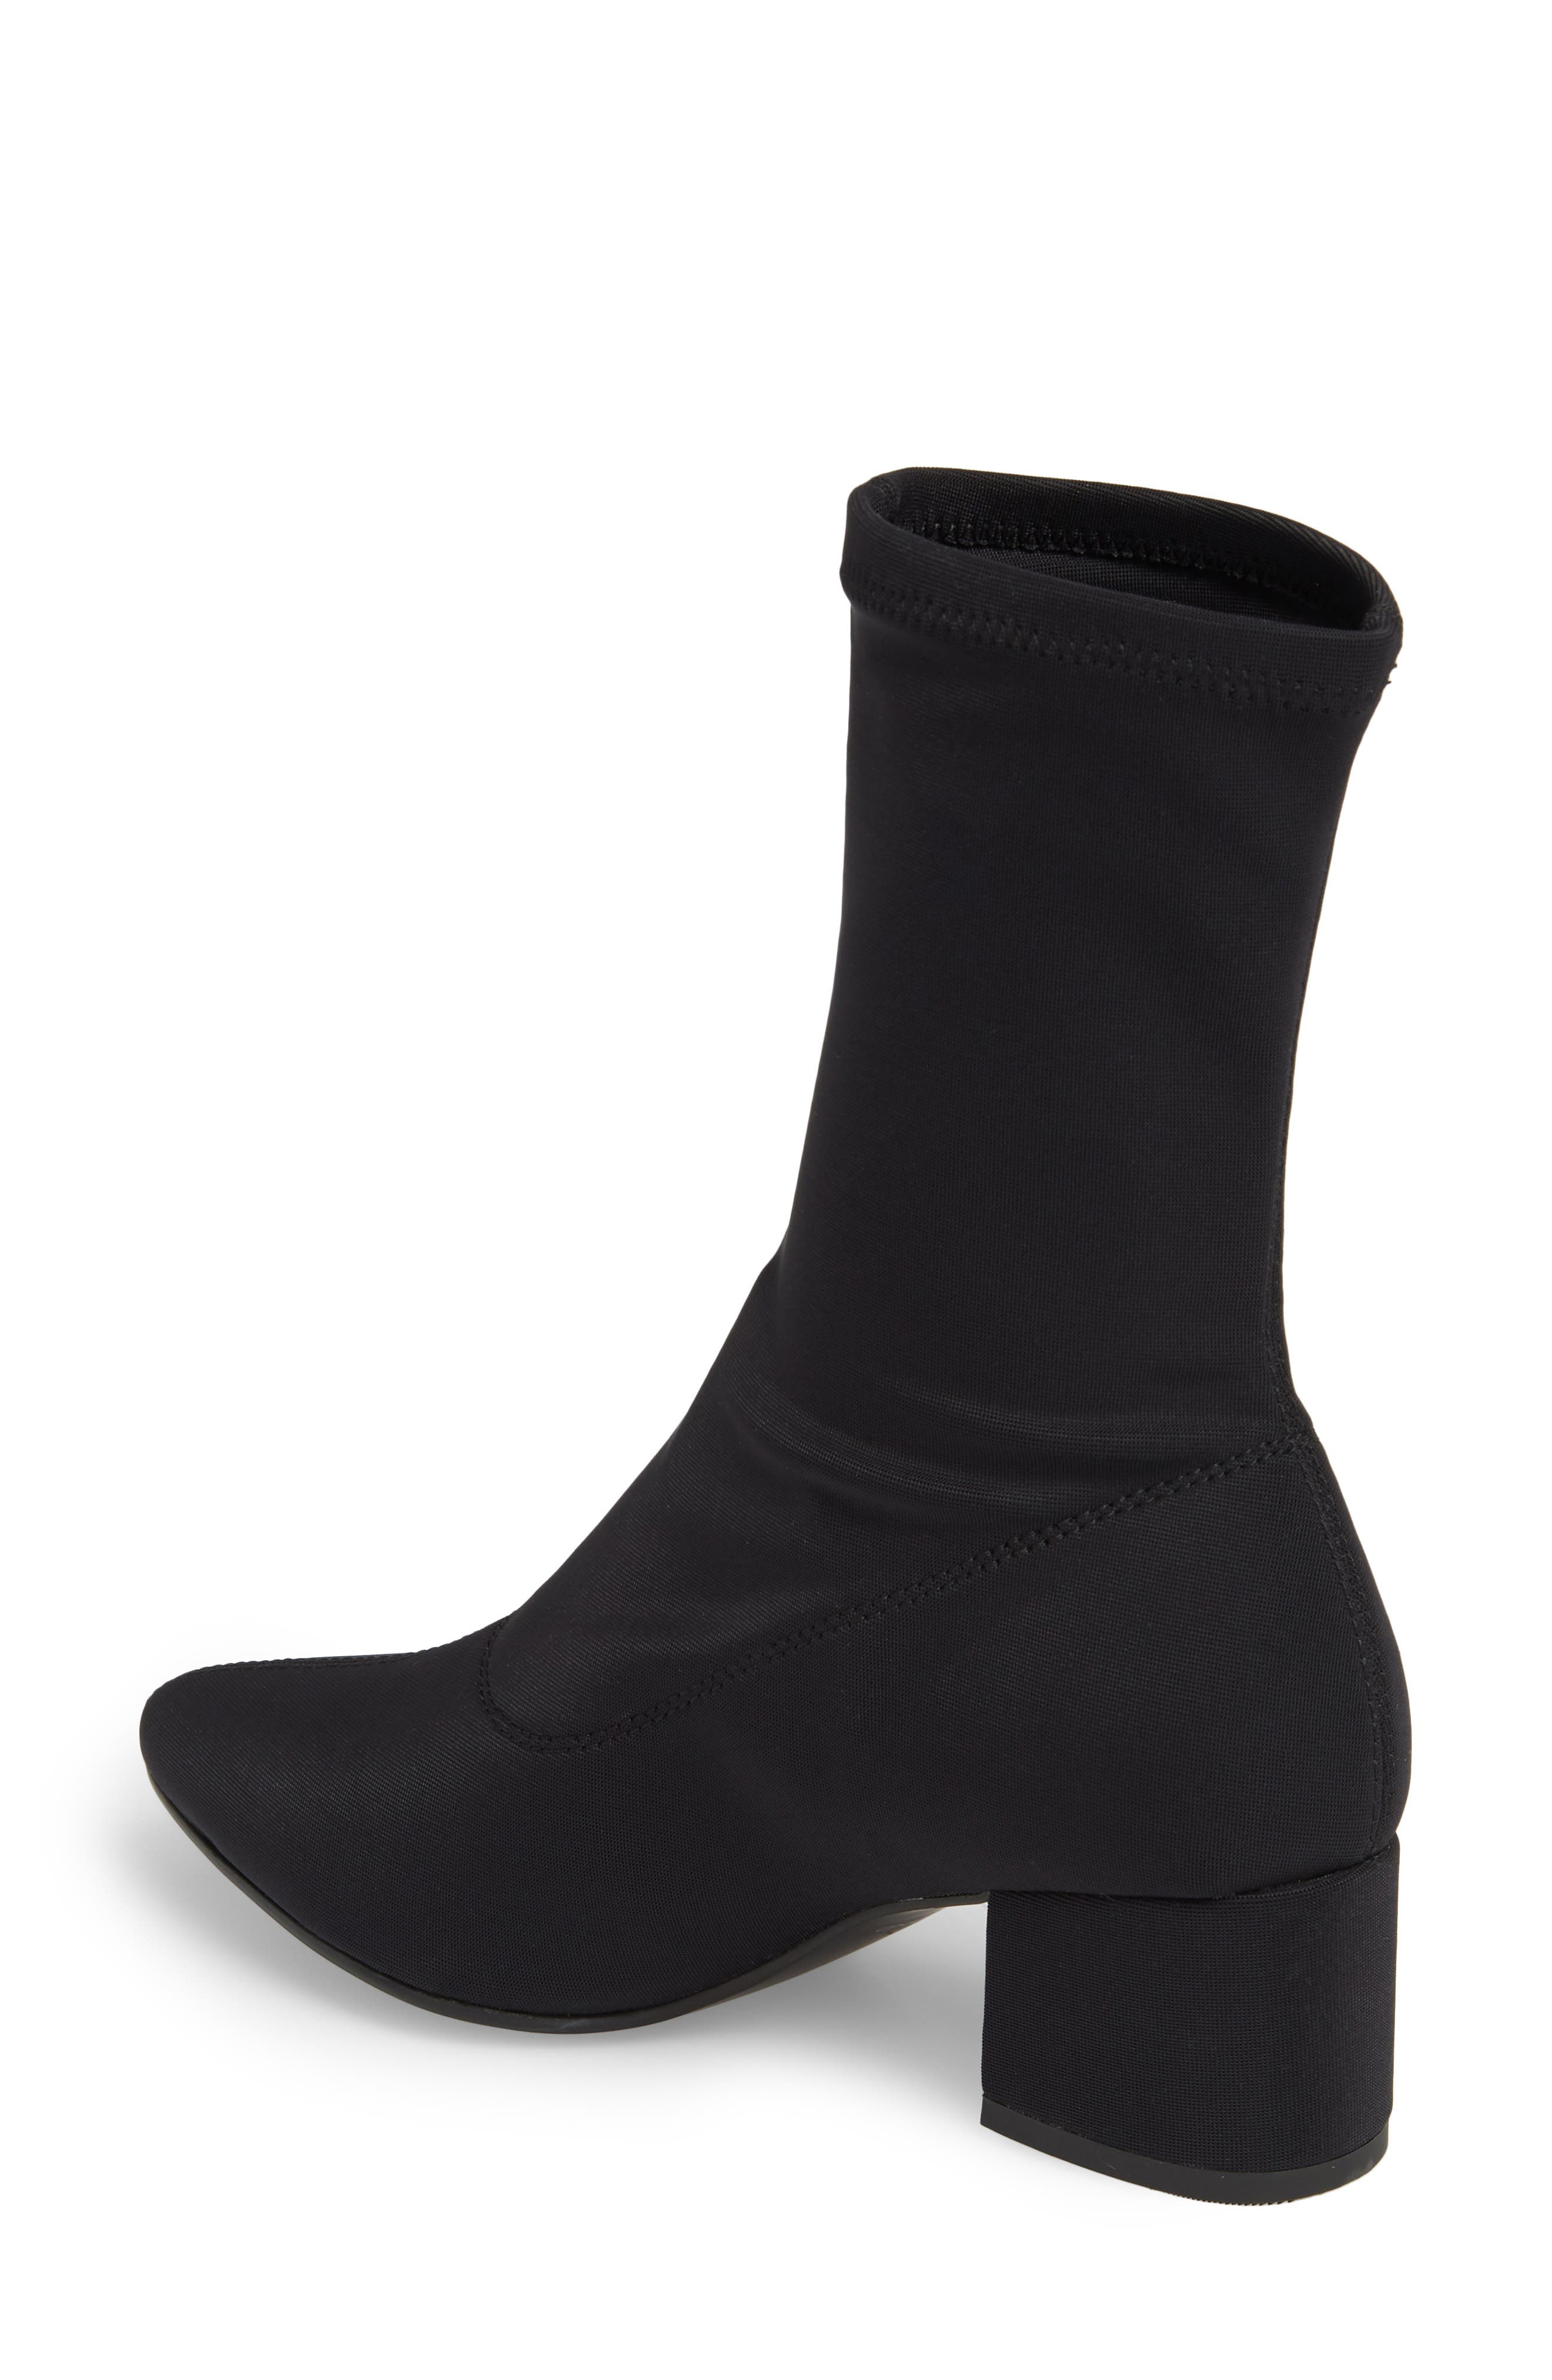 VAGABOND, Shoemakers Maya Stretch Bootie, Alternate thumbnail 2, color, BLACK FABRIC